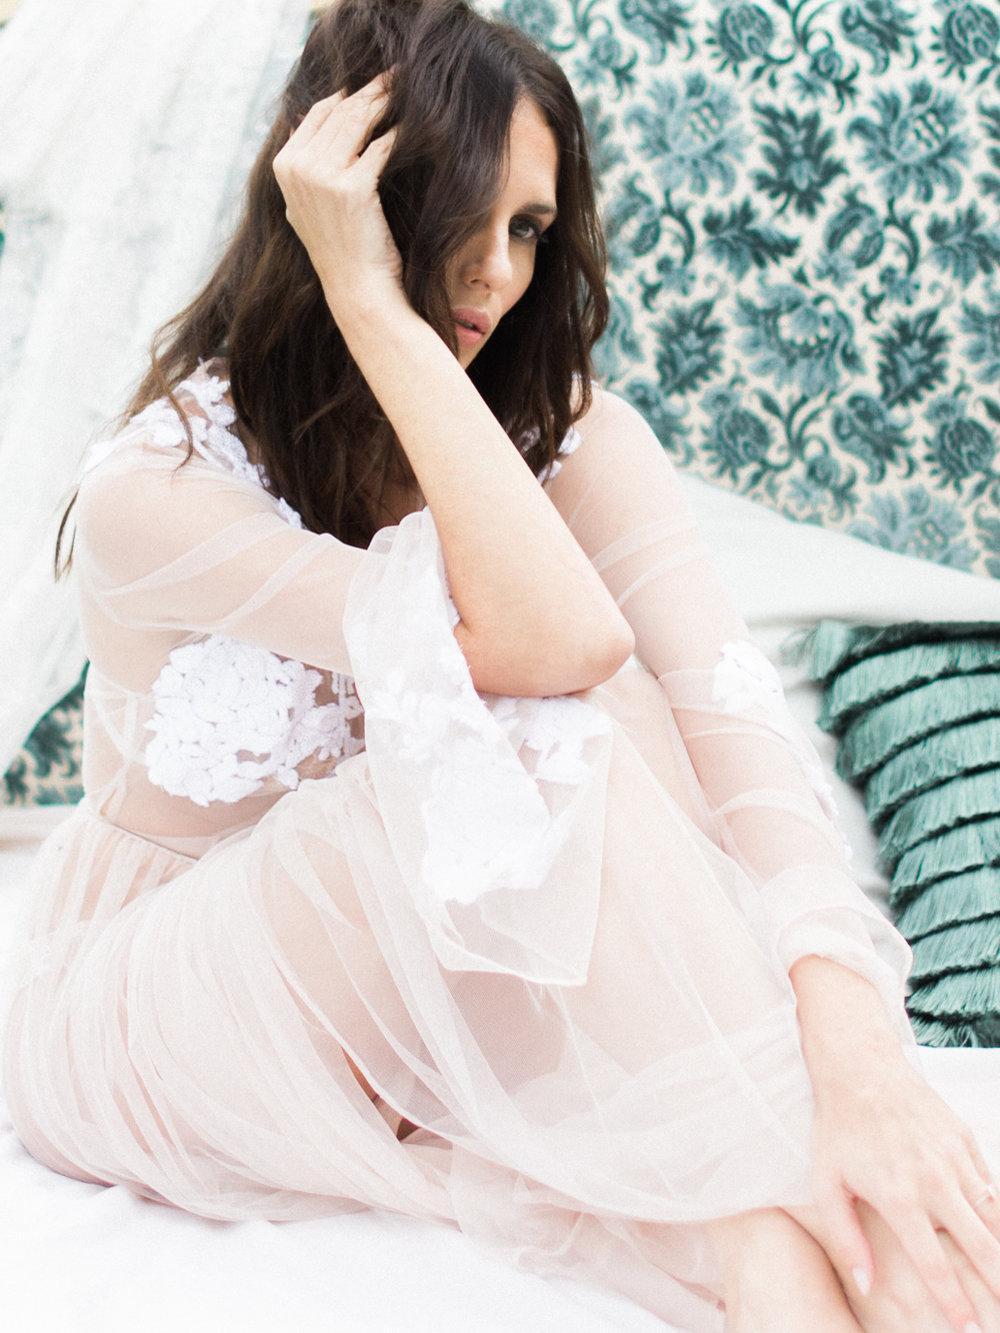 JacquelineAnnePhotography-Boudoir-Outdoors-2.jpg